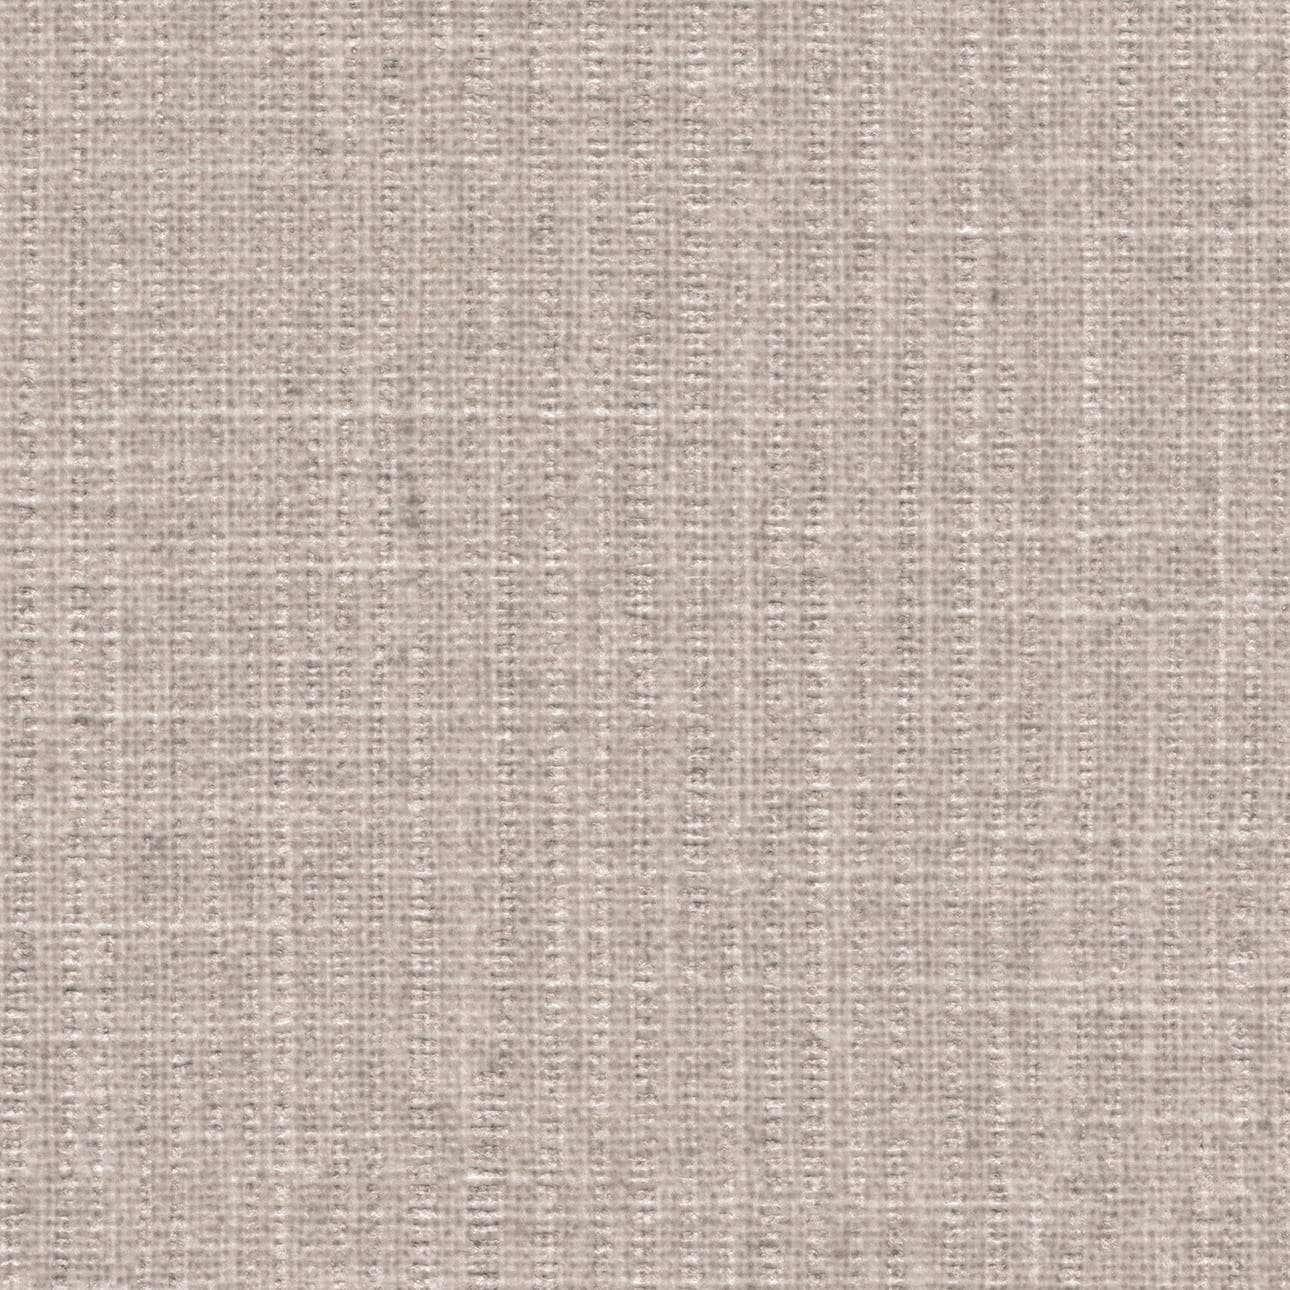 Poszewka Tomelilla 55x55cm w kolekcji Living, tkanina: 160-85